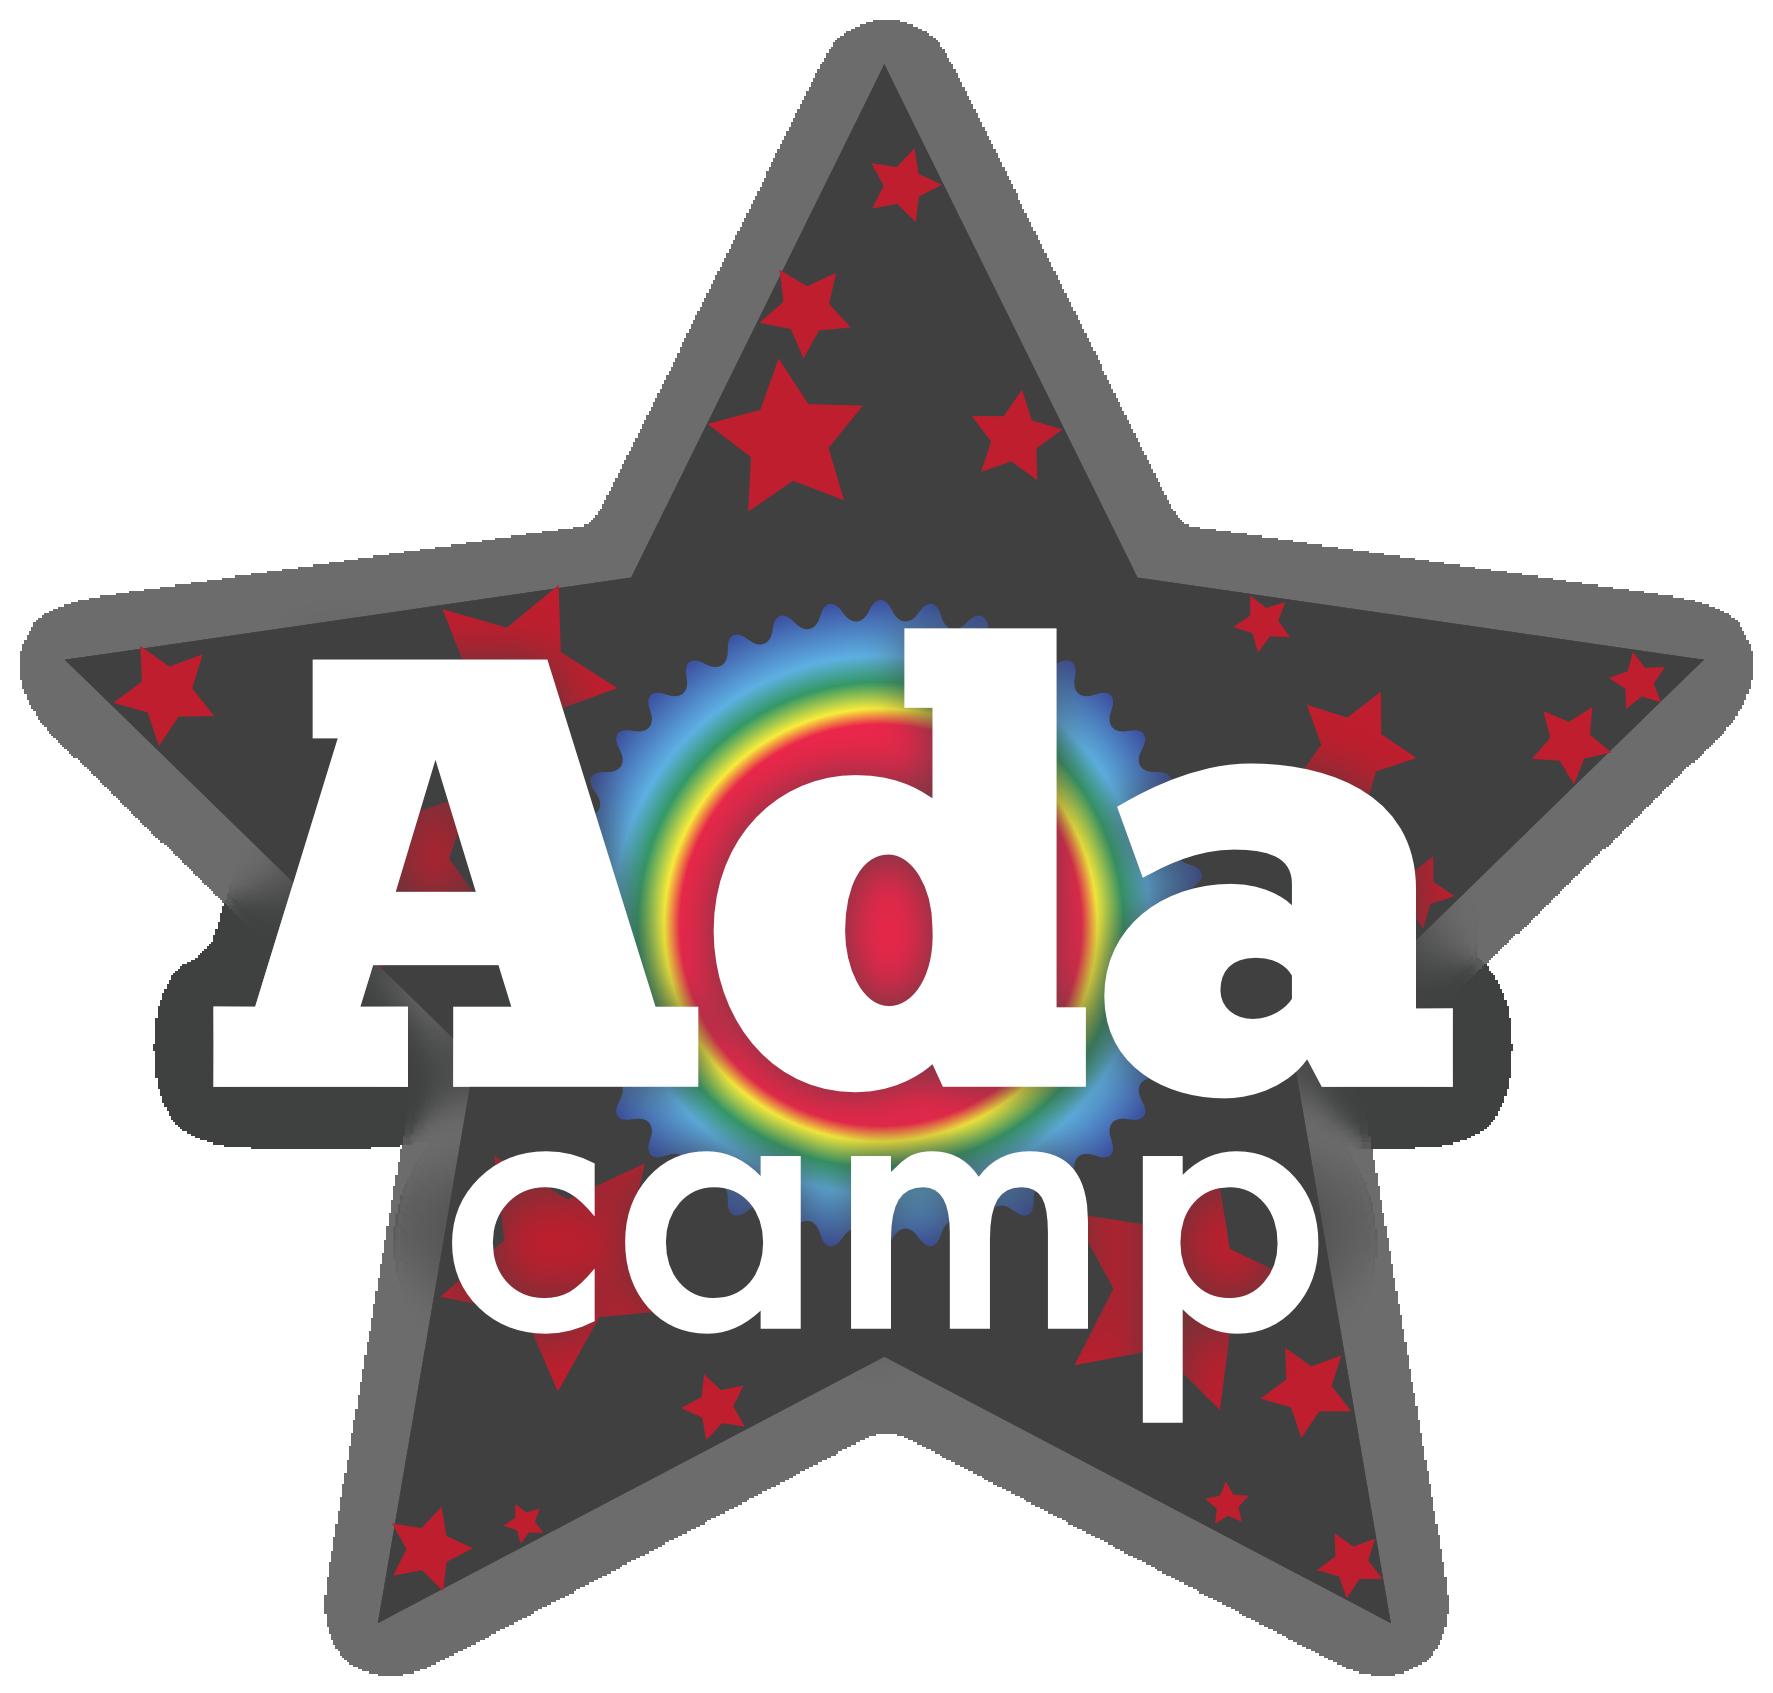 the AdaCamp star